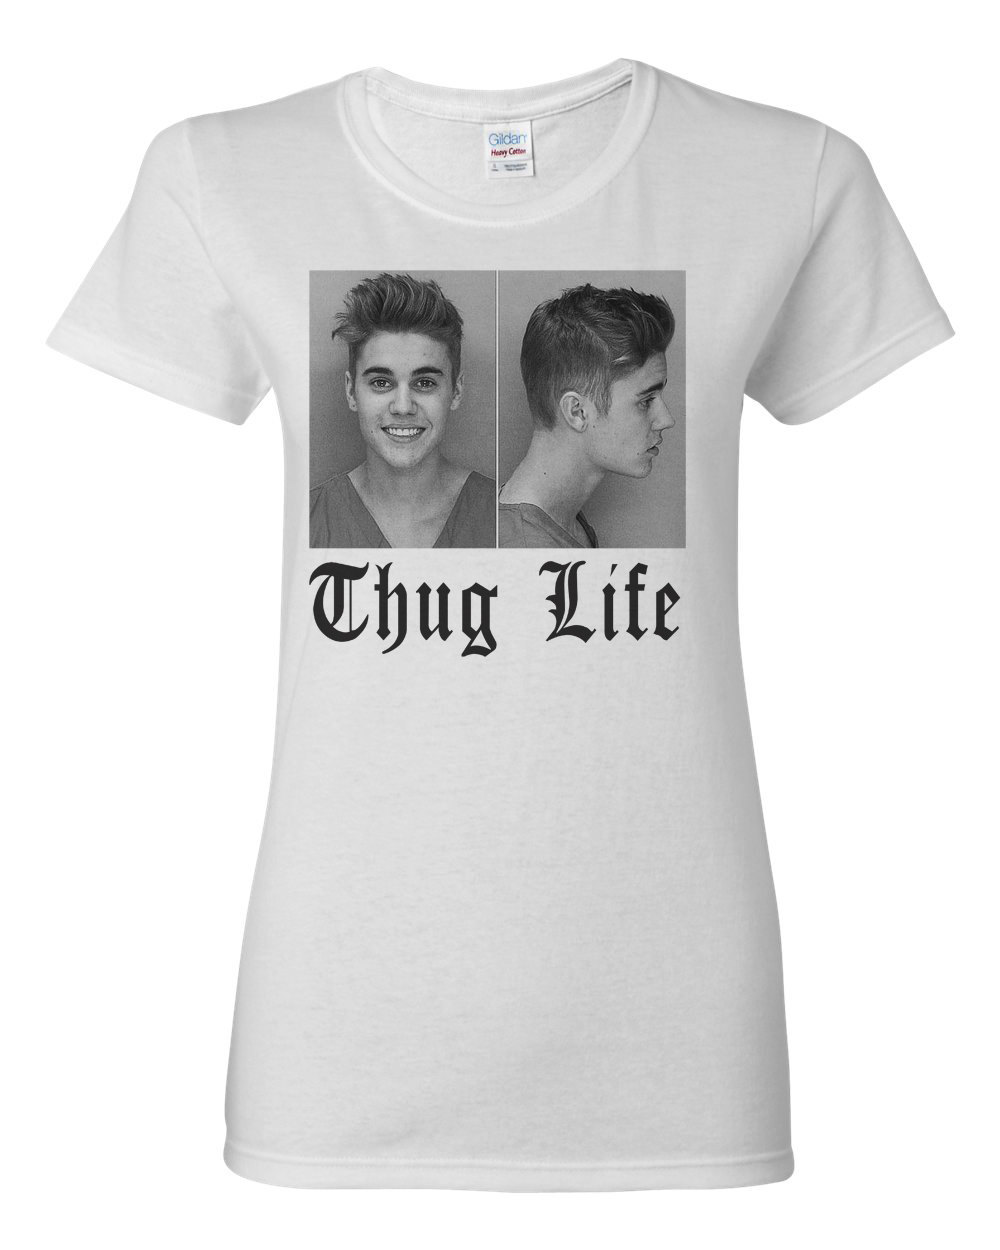 Justin bieber mugshot mug shot funny belieber ladies thug life womens t shirt